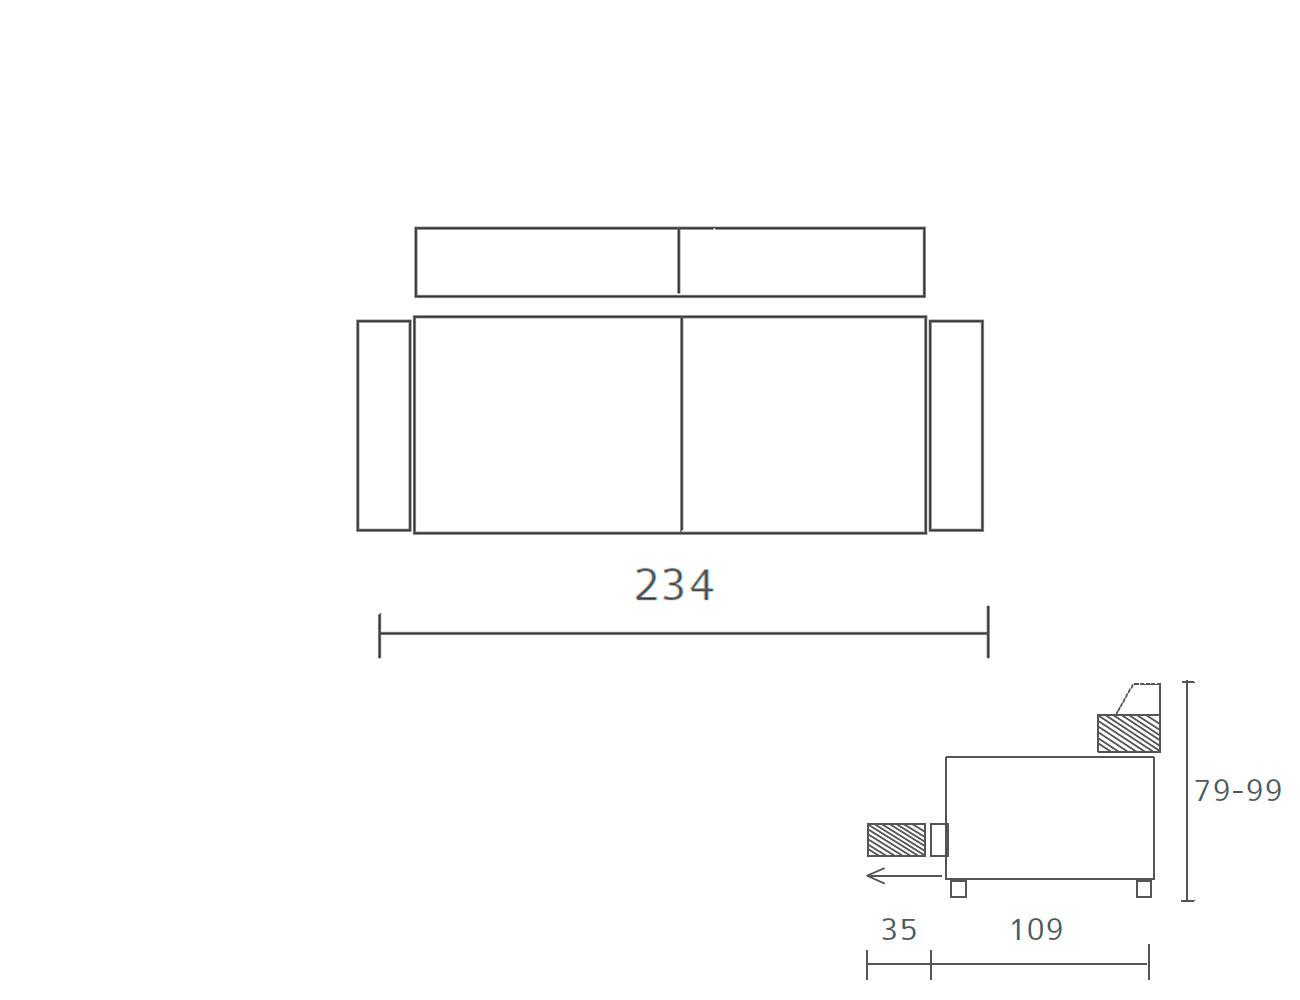 Sofa piel 234